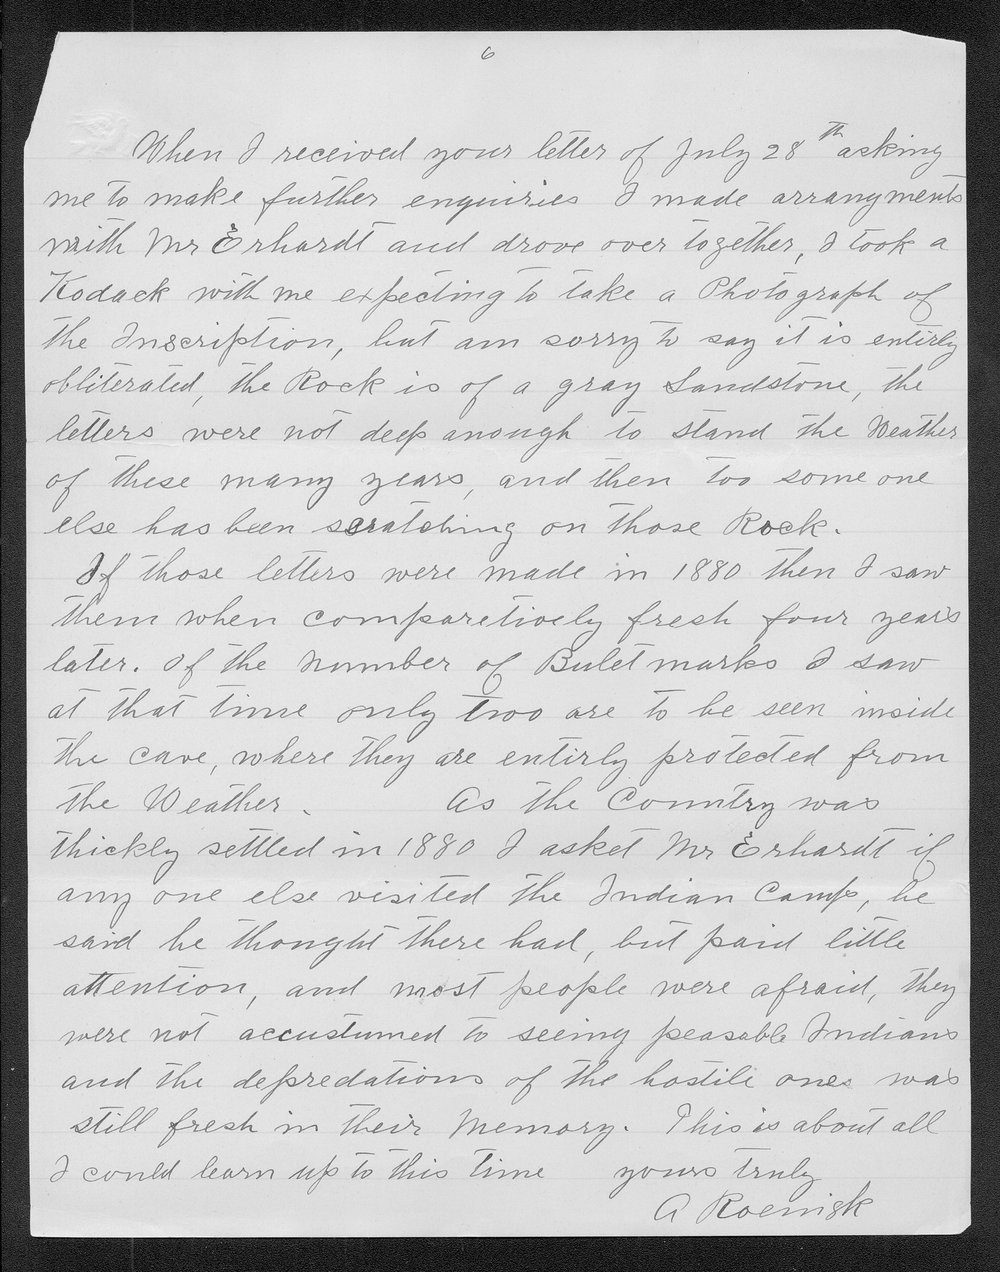 Adolph Roenigk and George W. Martin correspondence - 6